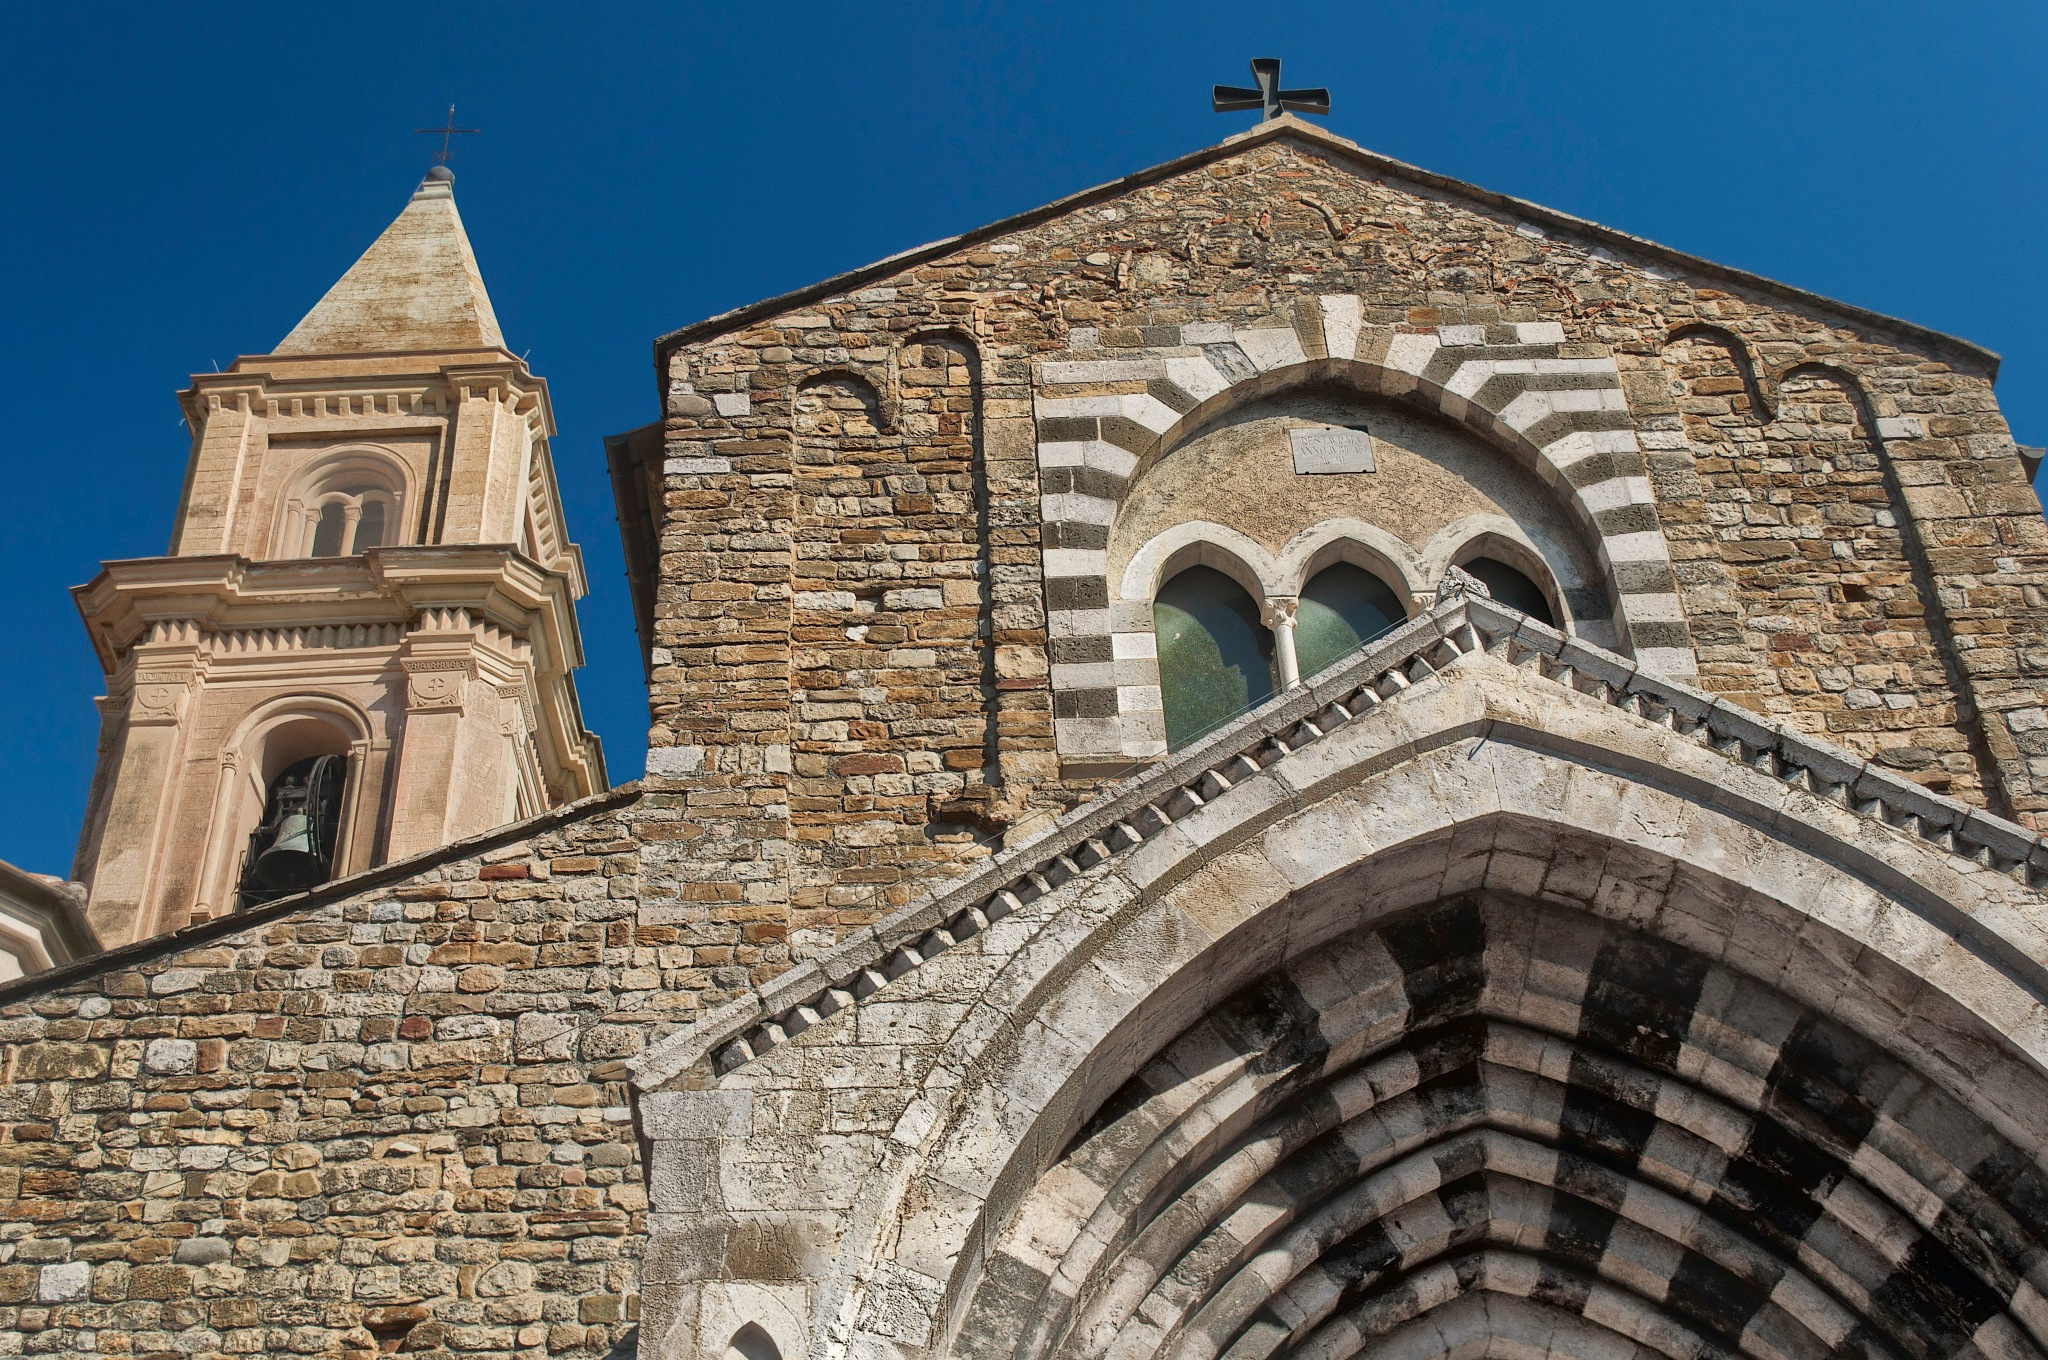 The western façade of Chiesa di San Michele Arcangelo in Ventimiglia by David Henry